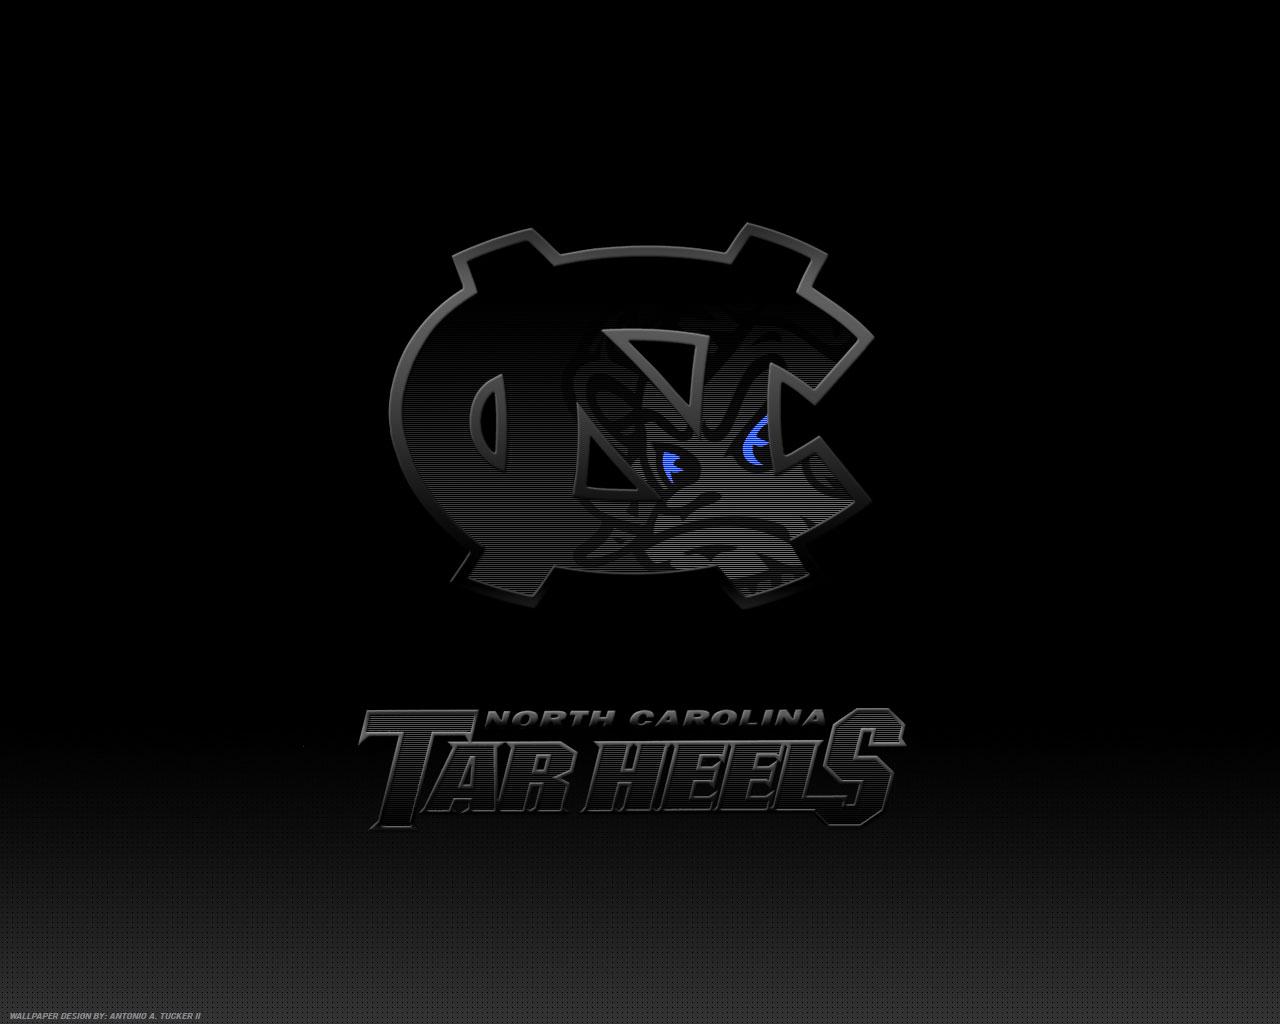 UNC Tar Heels Logo background wallpaper for desktop or web site Get 1280x1024